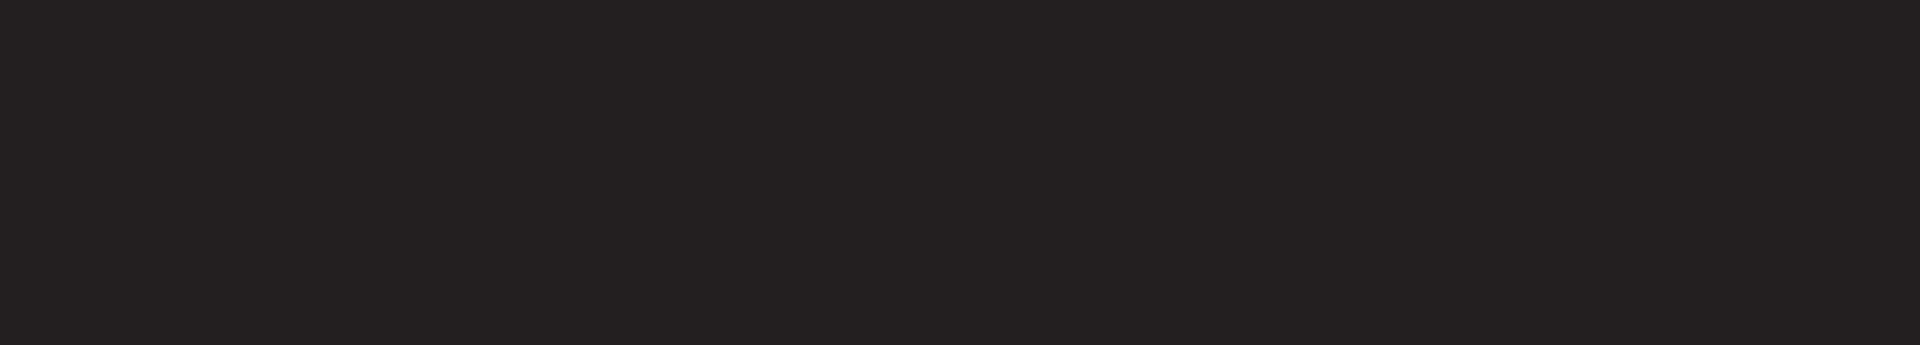 grayblack-background